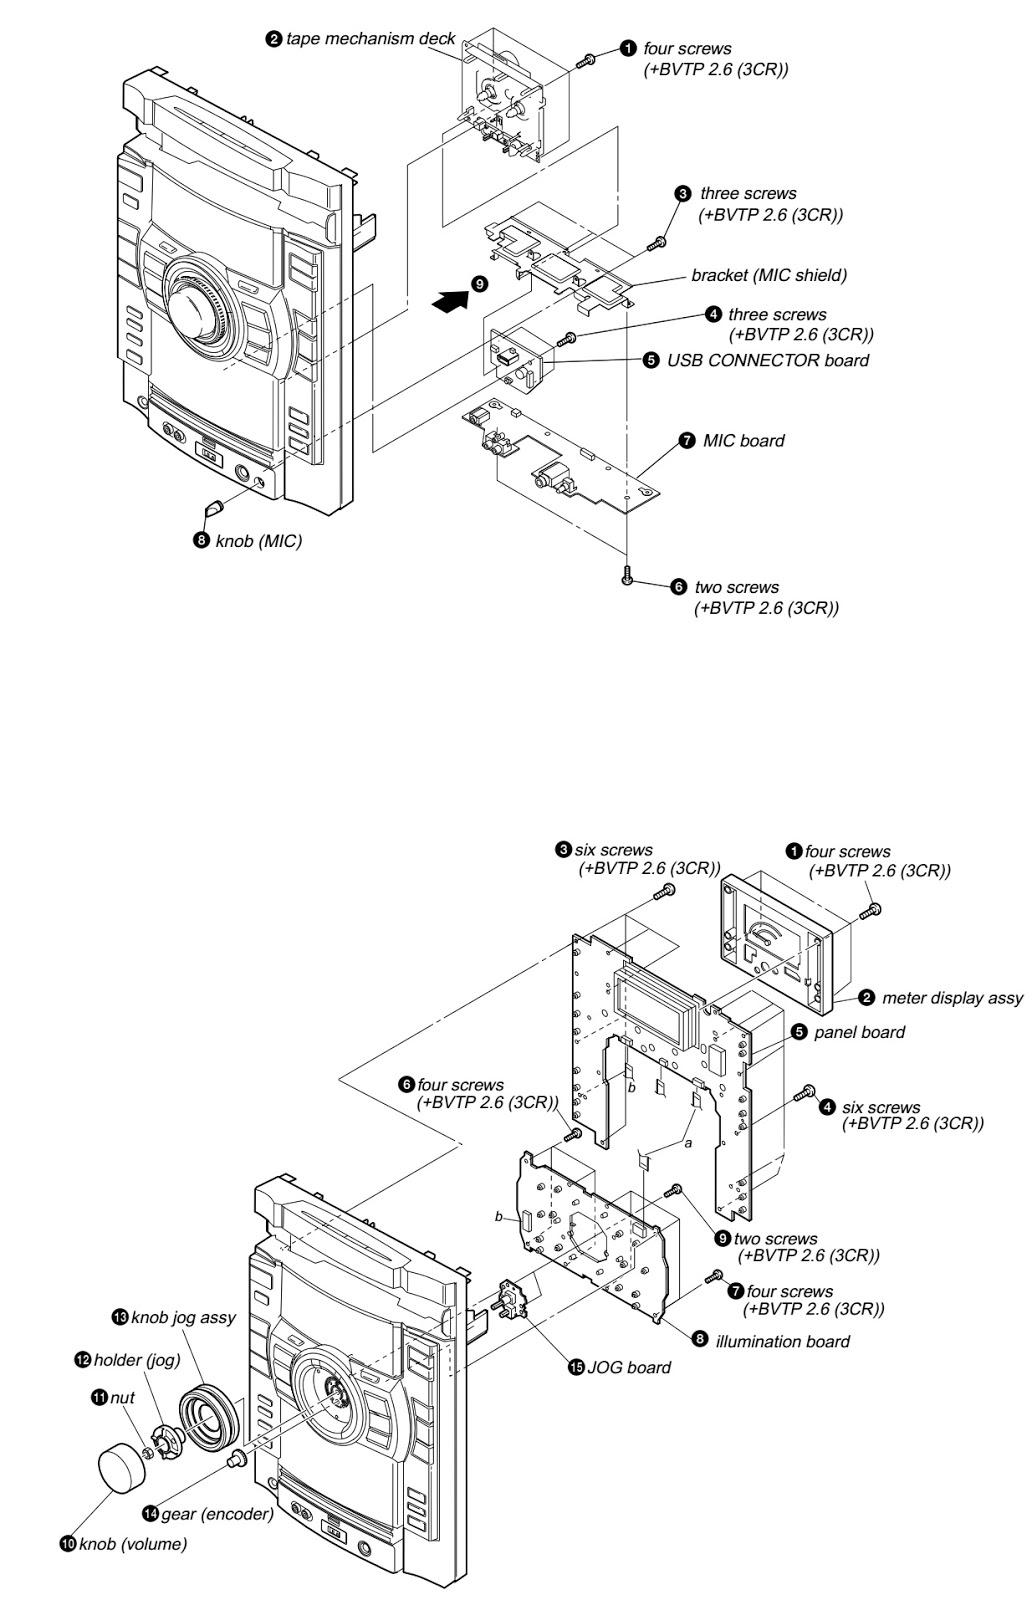 Sony Cd Decks